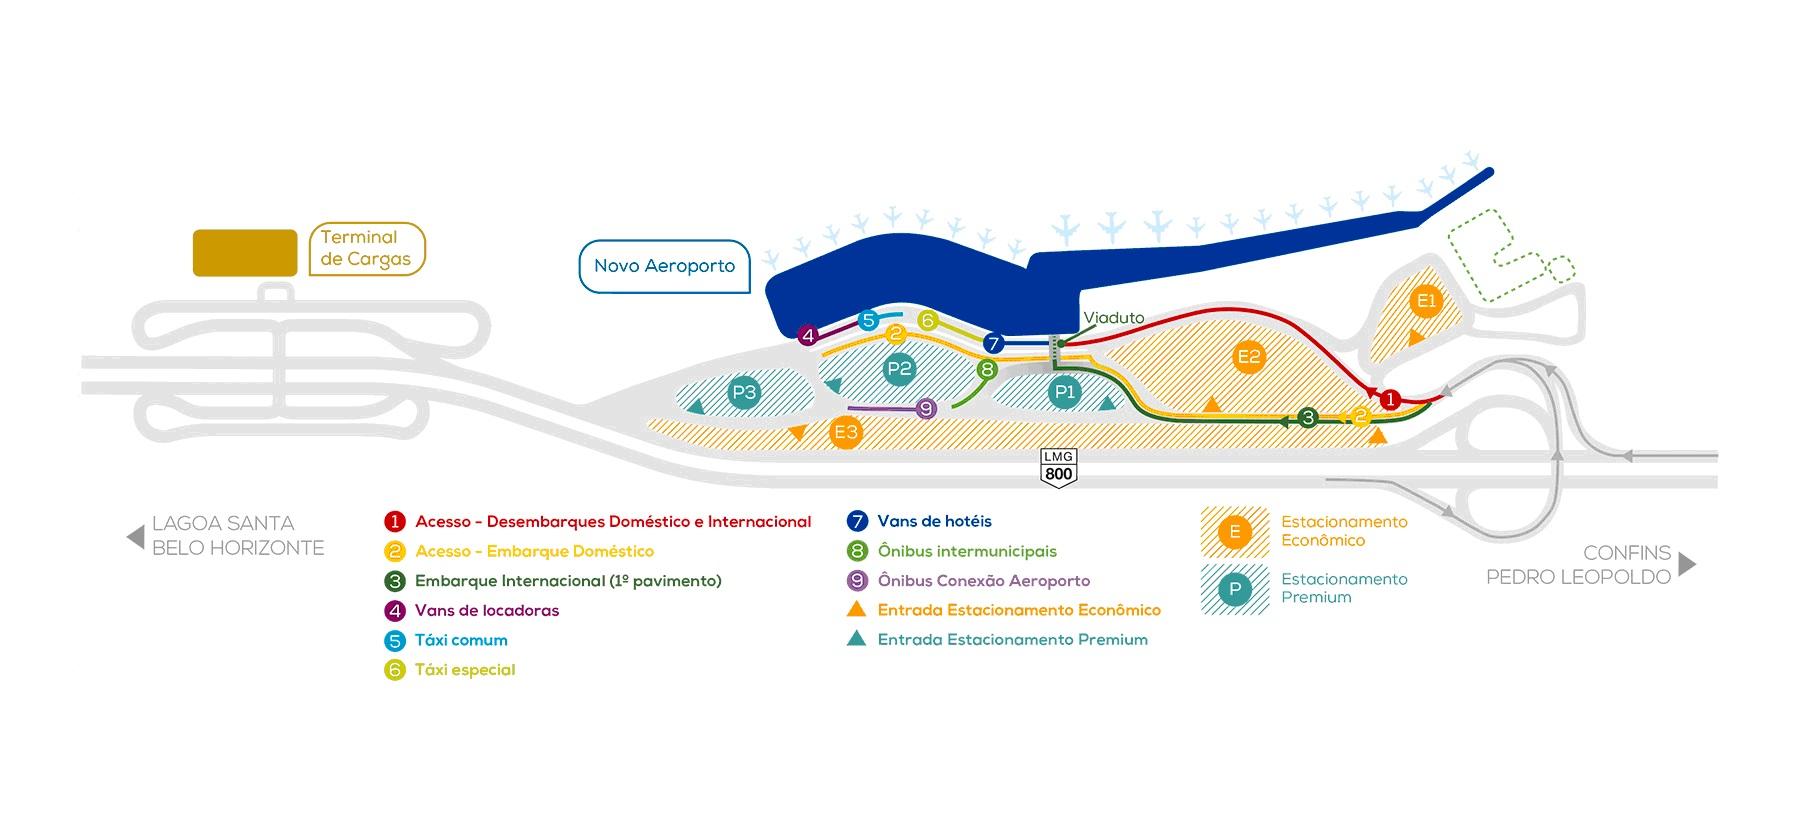 bh-airport-mapa-2016